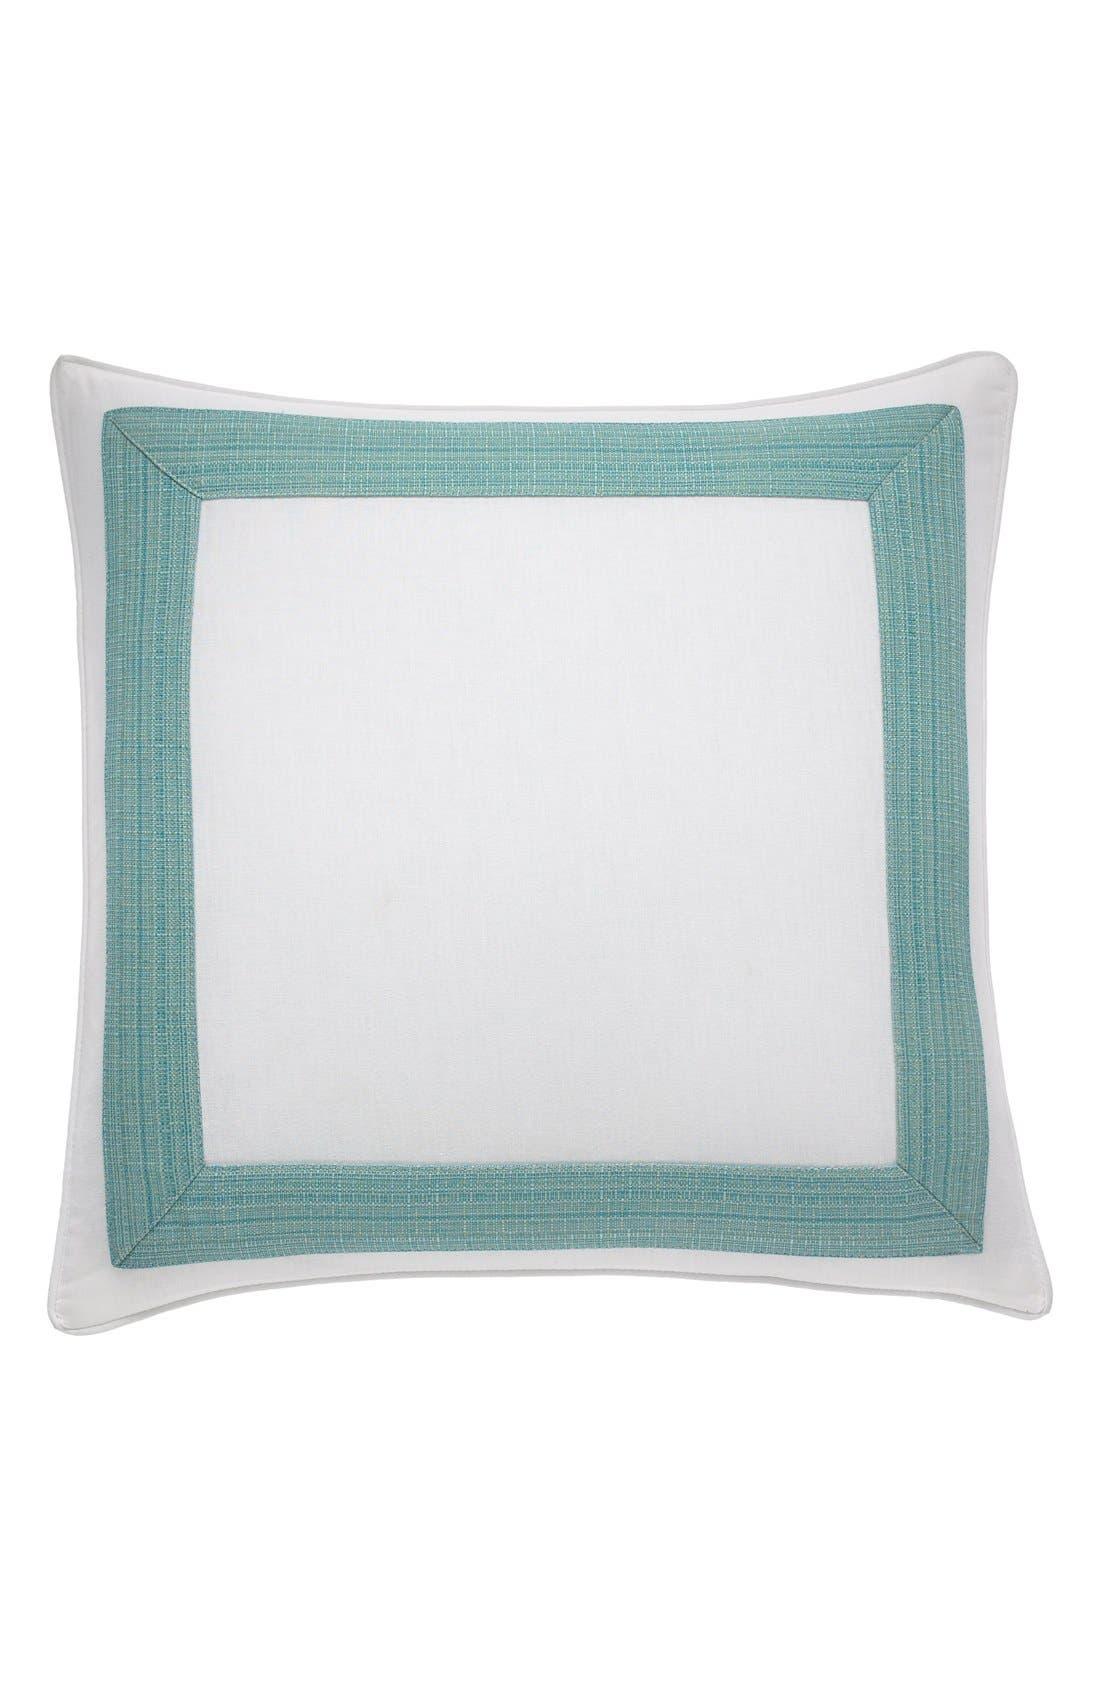 Tommy Bahama 'Seaglass Border' Pillow